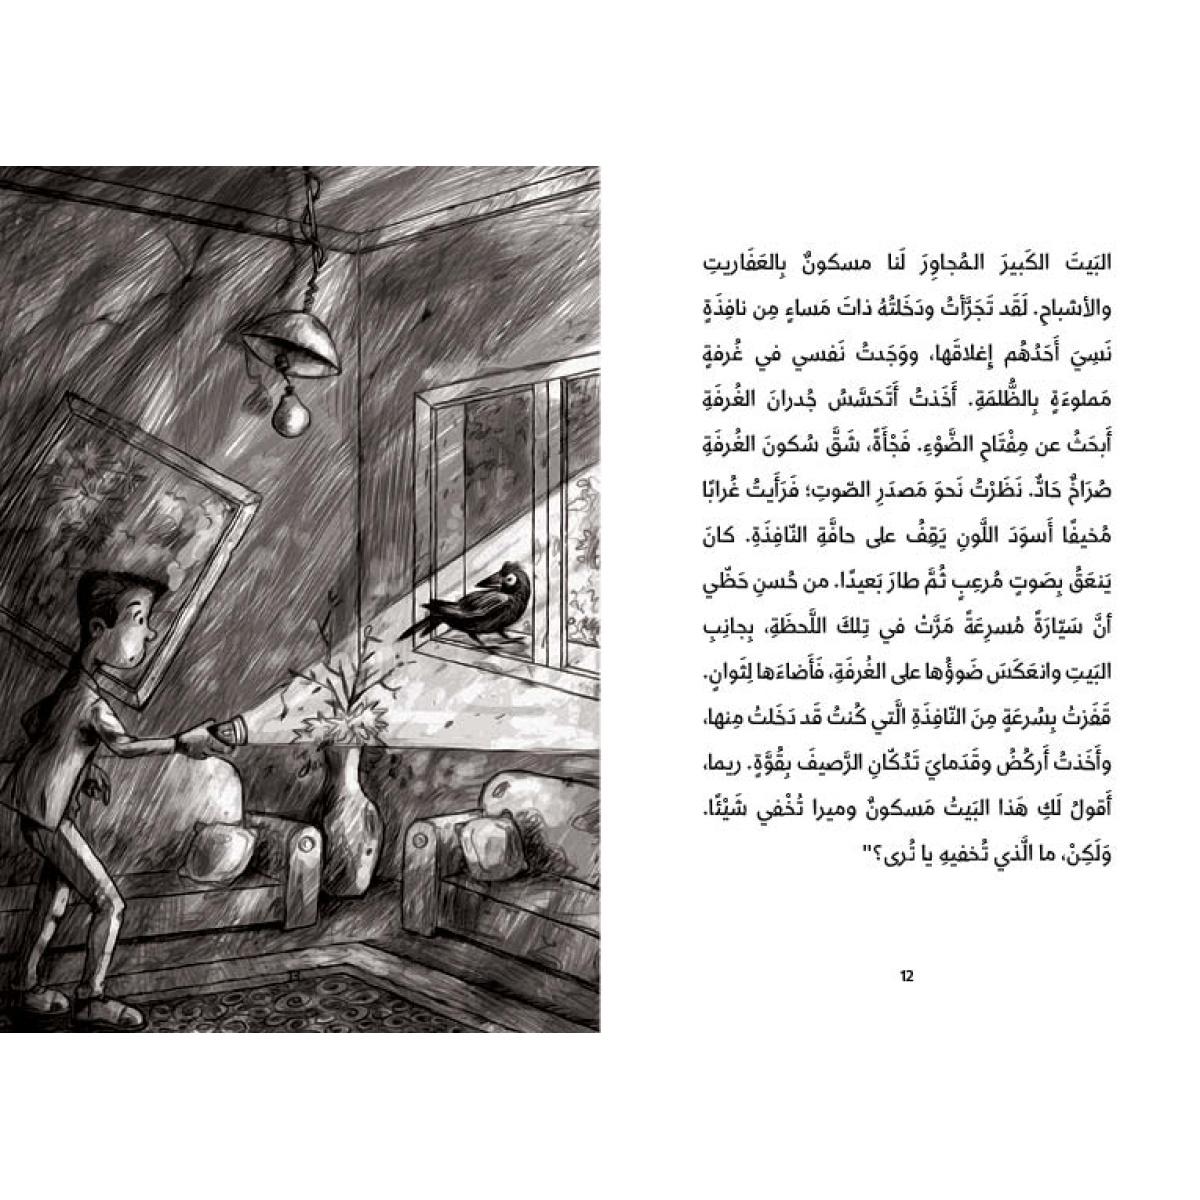 Ahmad Akkad The Haunted House Spread2 Dar Al Yasmine Publishing and Distribution